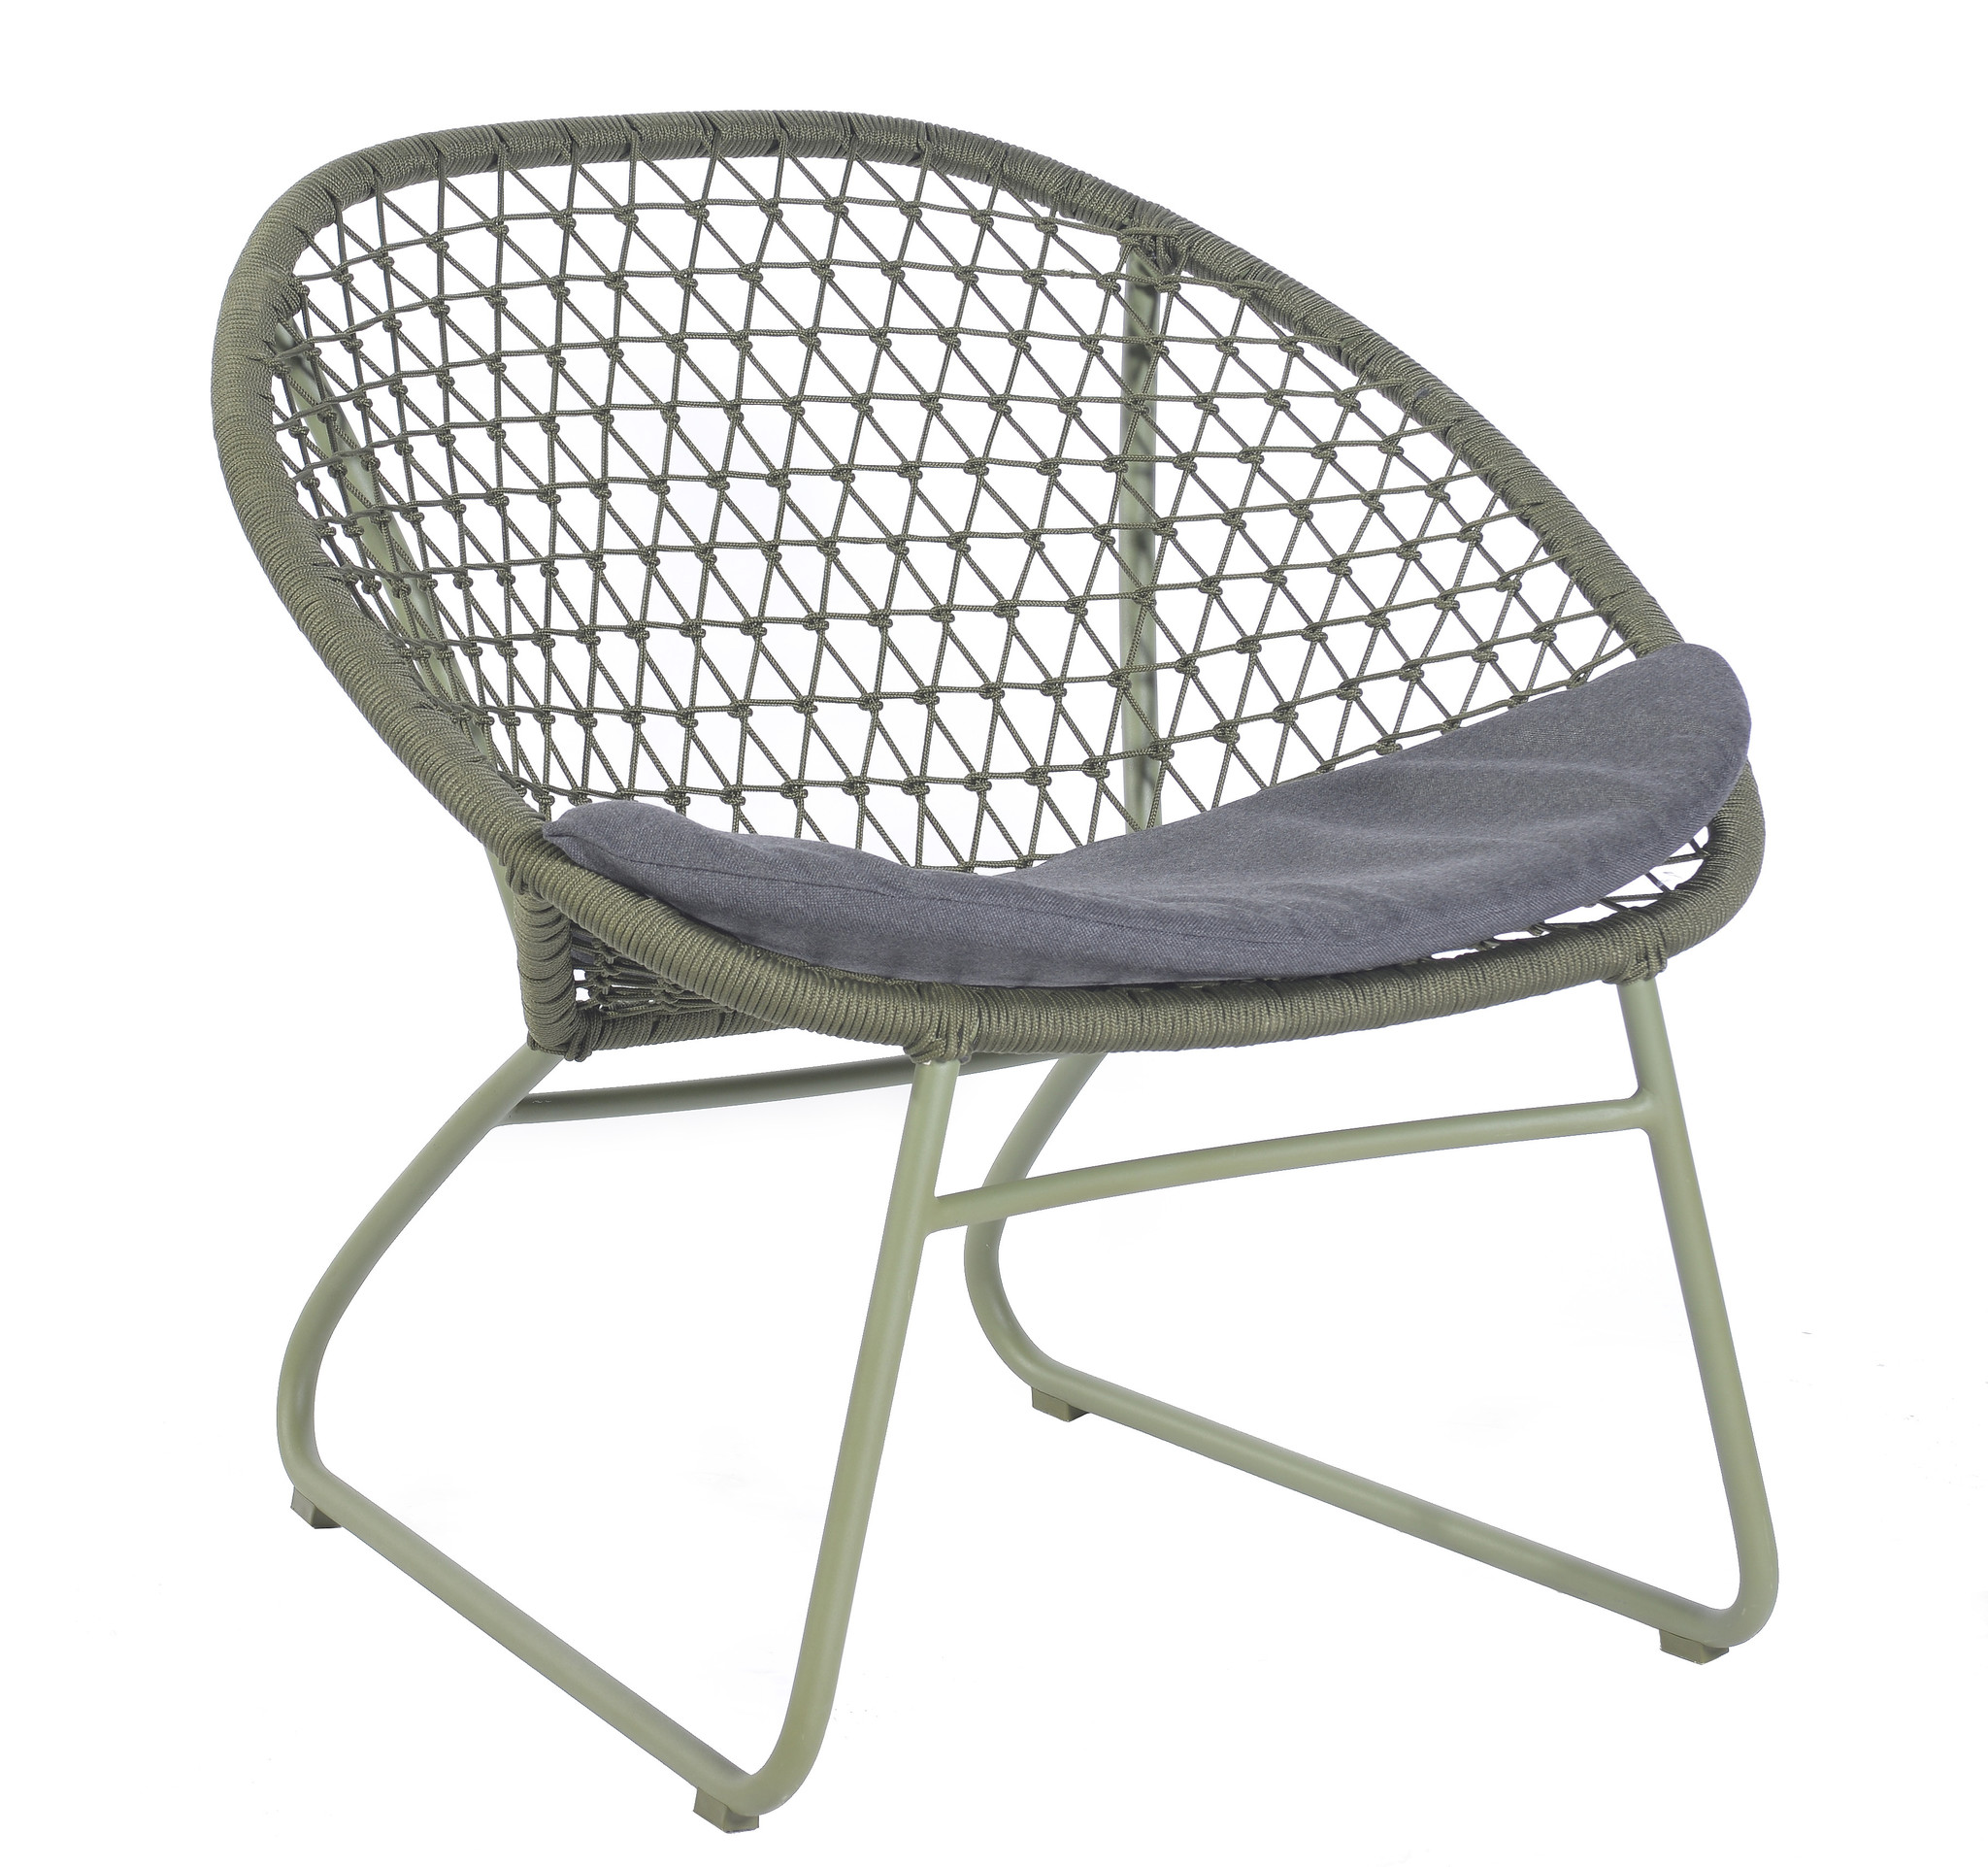 Max & Luuk Bella Chair - Moss